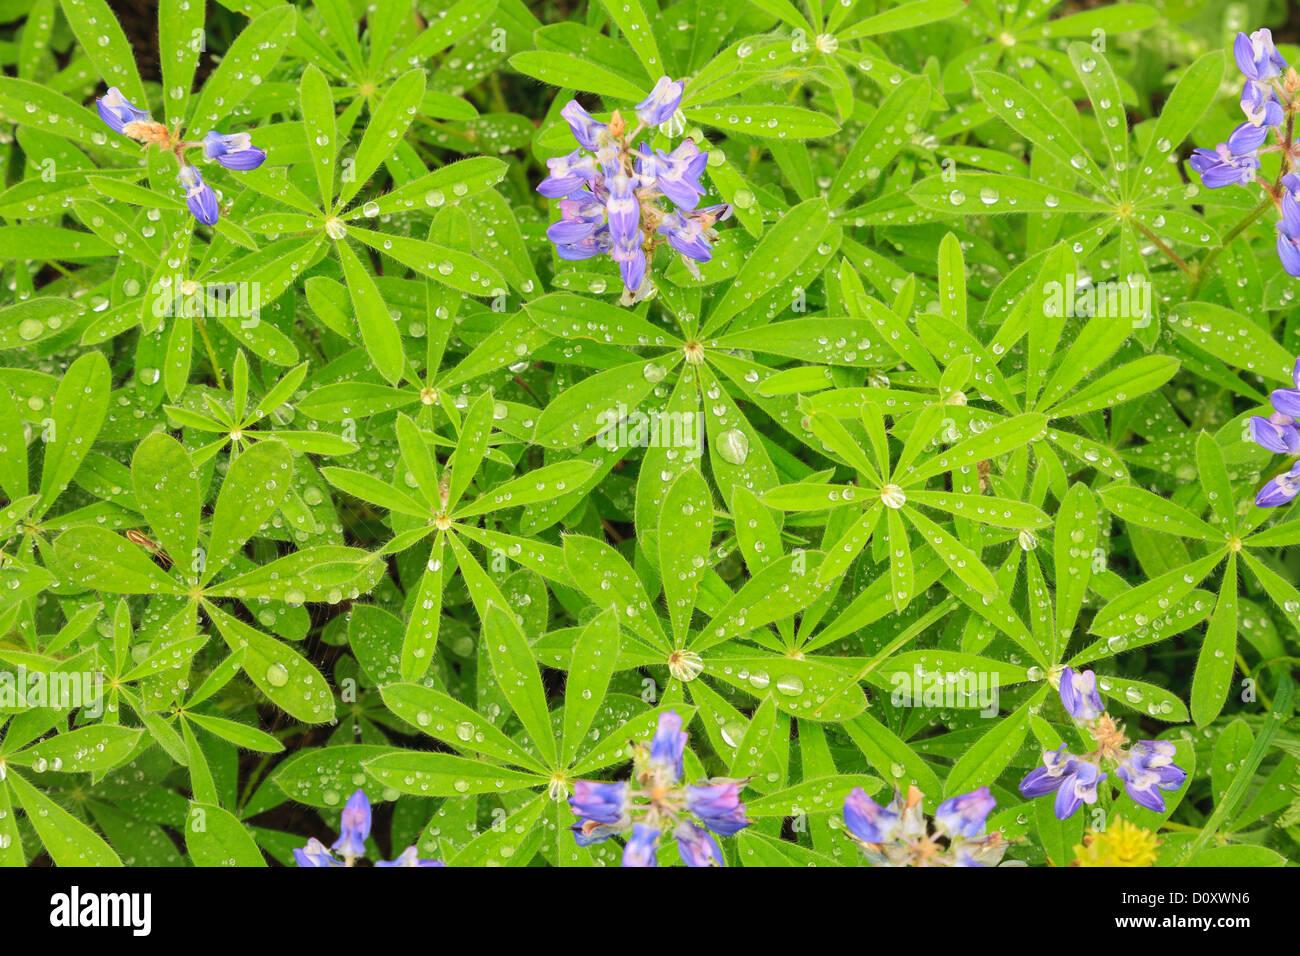 Summer alpine wild flowers, Mount Rainier National Park, Washington, USA - Stock Image